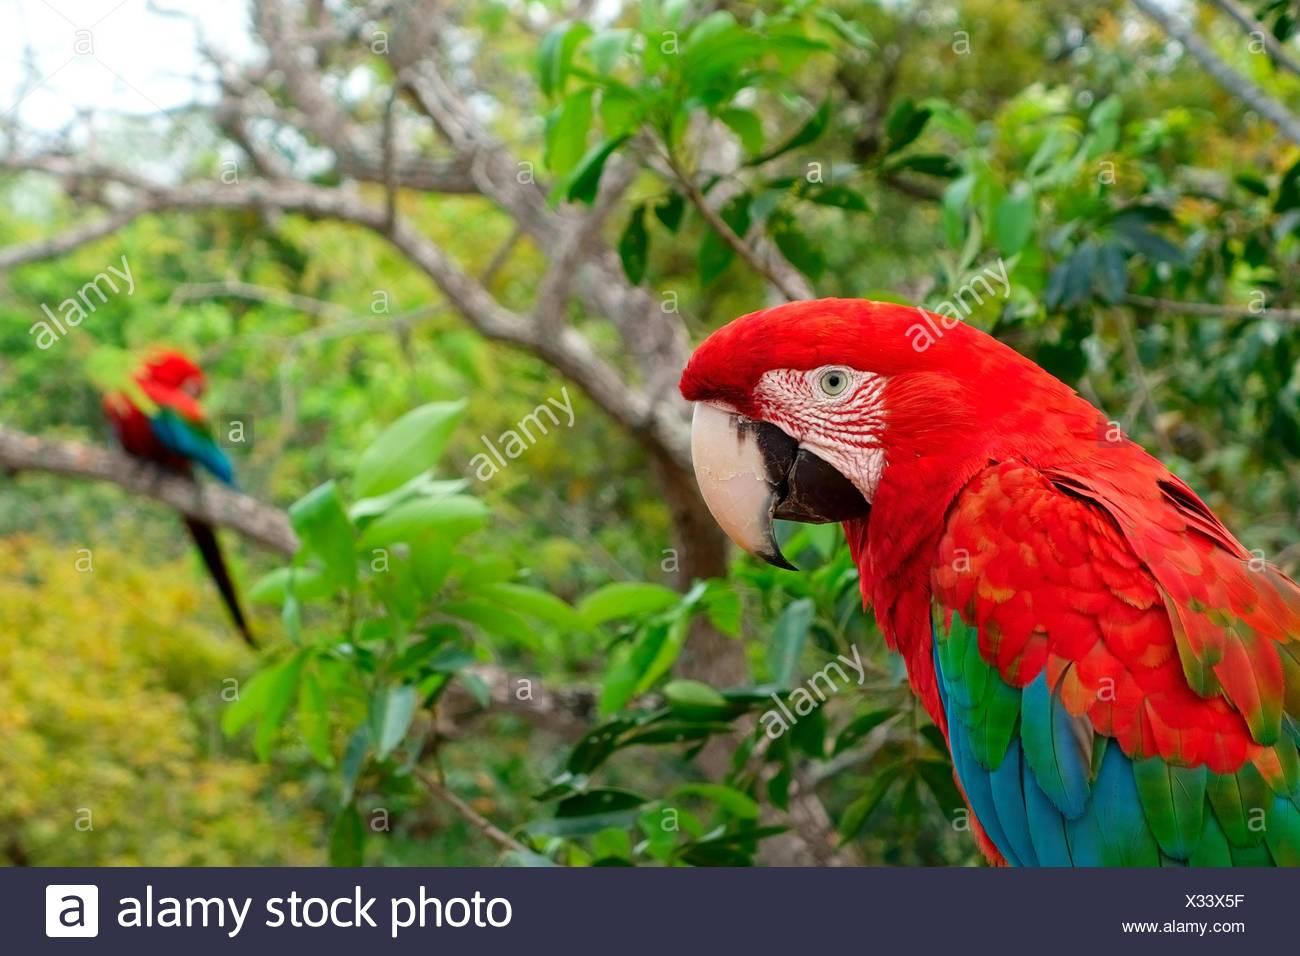 Red-and-green macaw (Ara chloroptera), Buraco das Araras, Jardim, Matto Grosso do Sul, Brazil - Stock Image